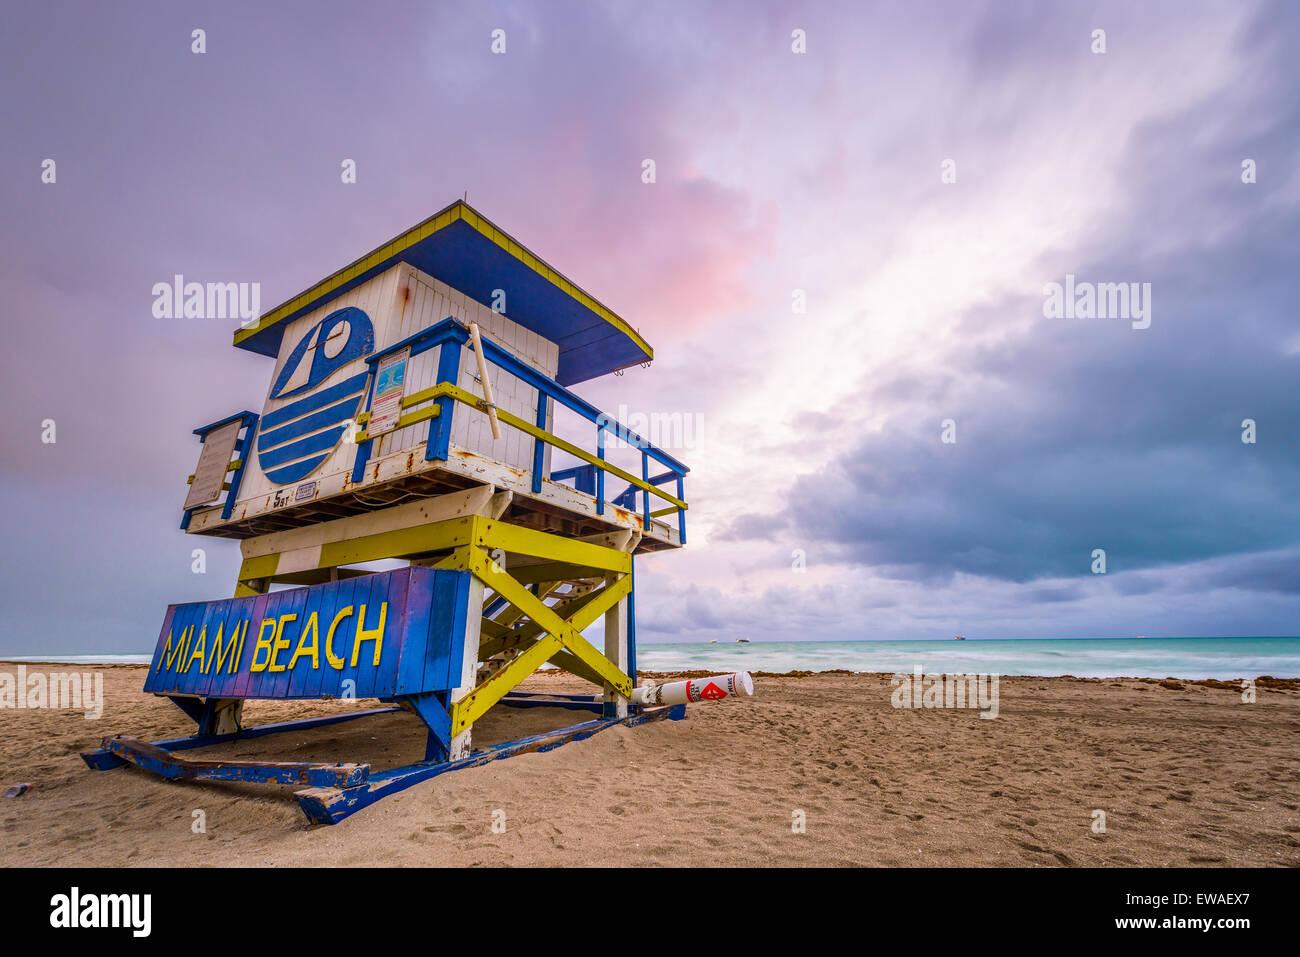 Miami Beach, Florida, Stati Uniti d'America vita torre di guardia. Immagini Stock